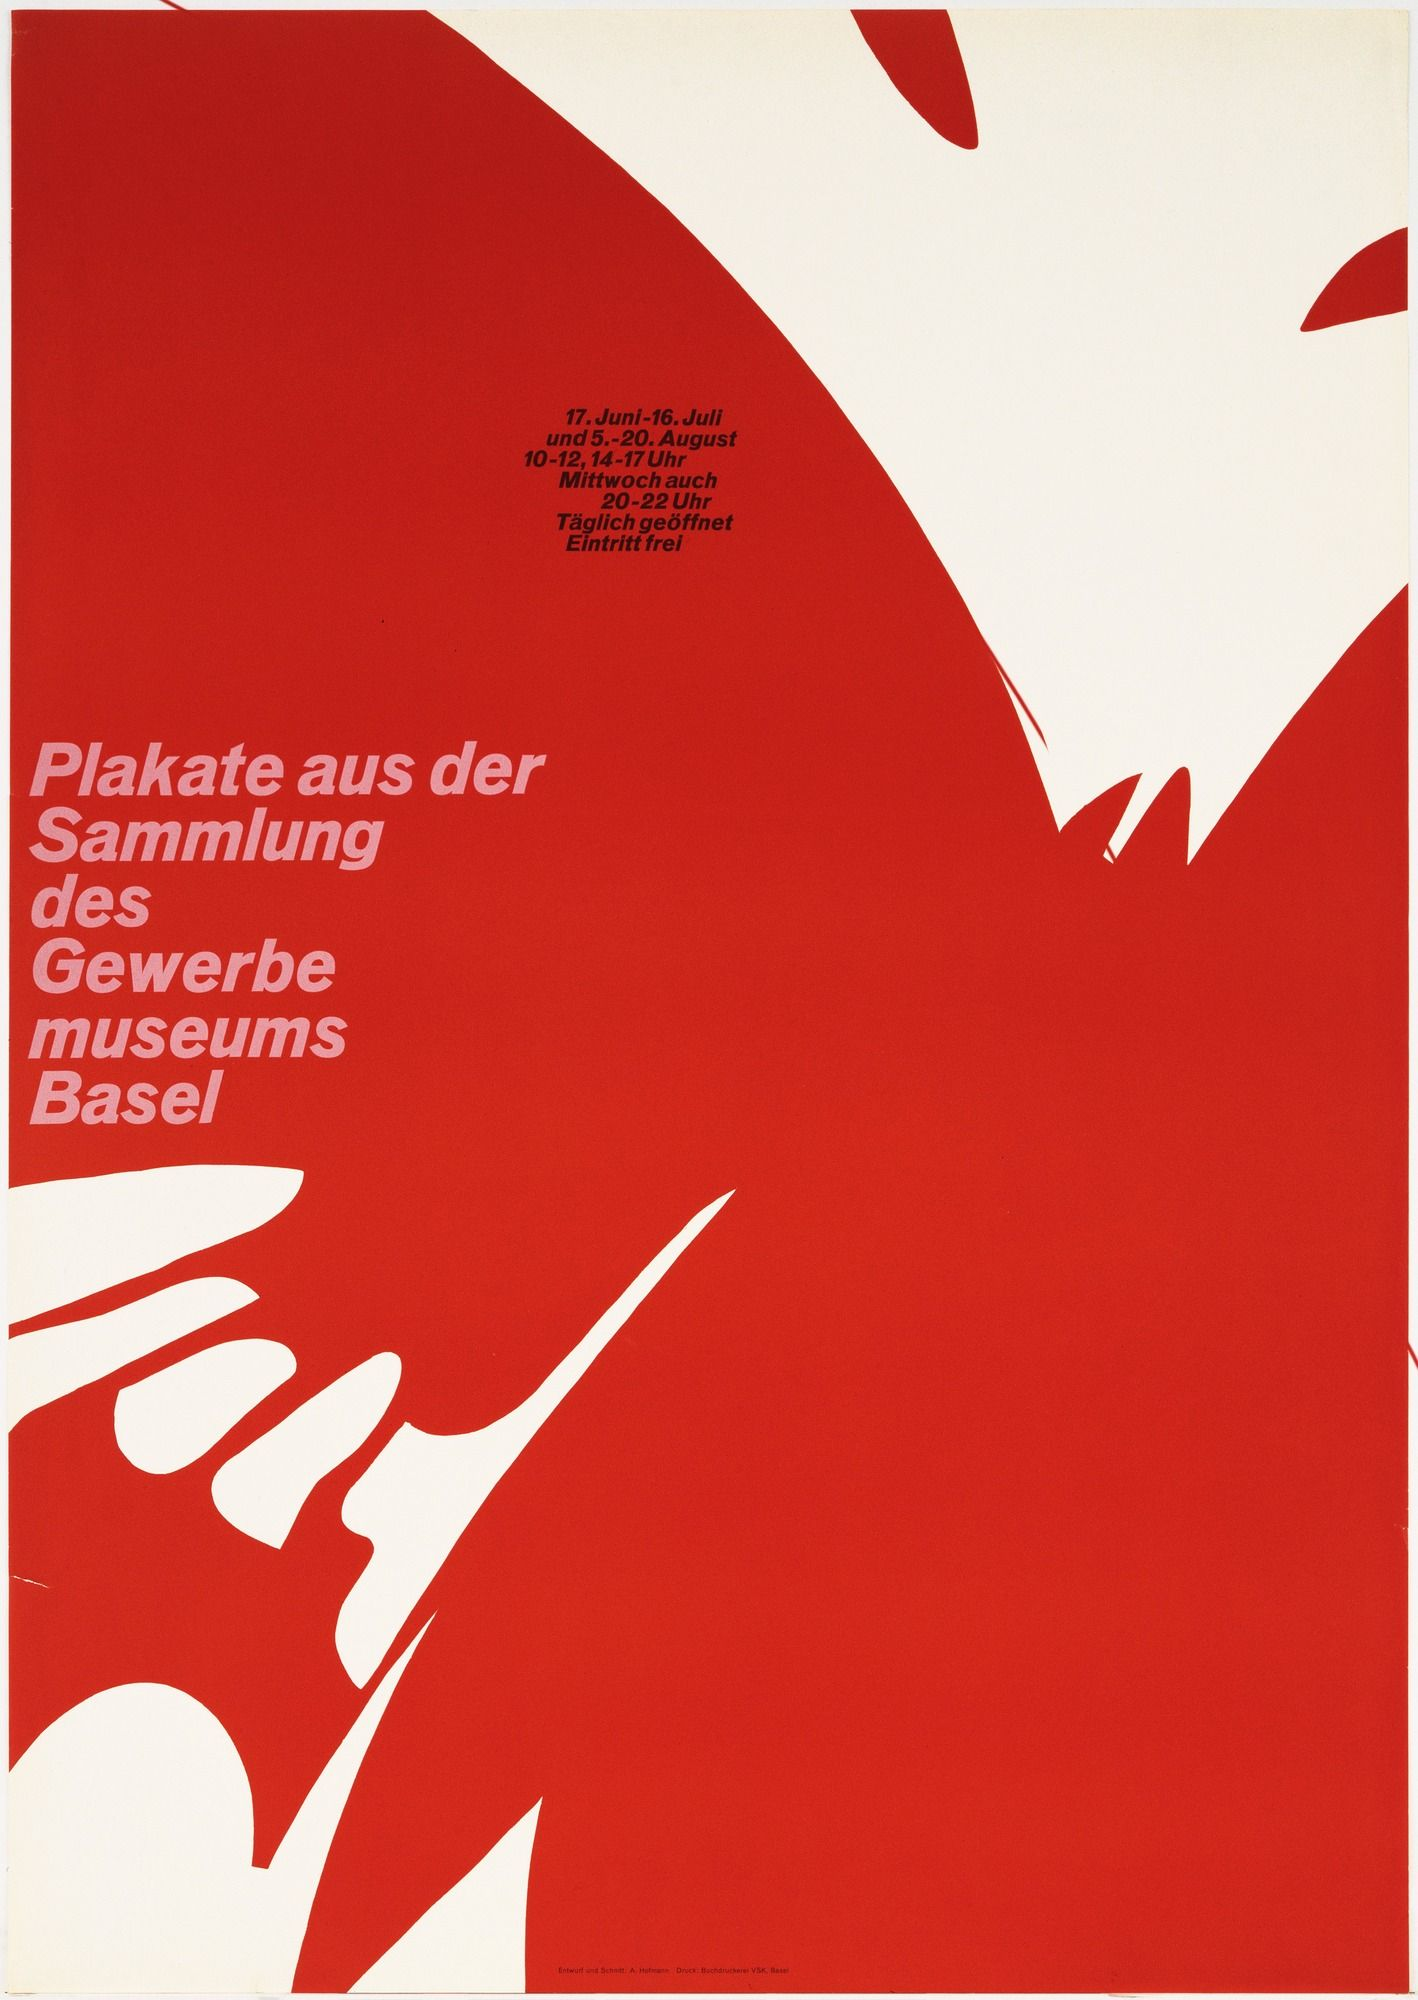 Armin hofmann plakate aus der sammlung des gewerbe for Armin hofmann